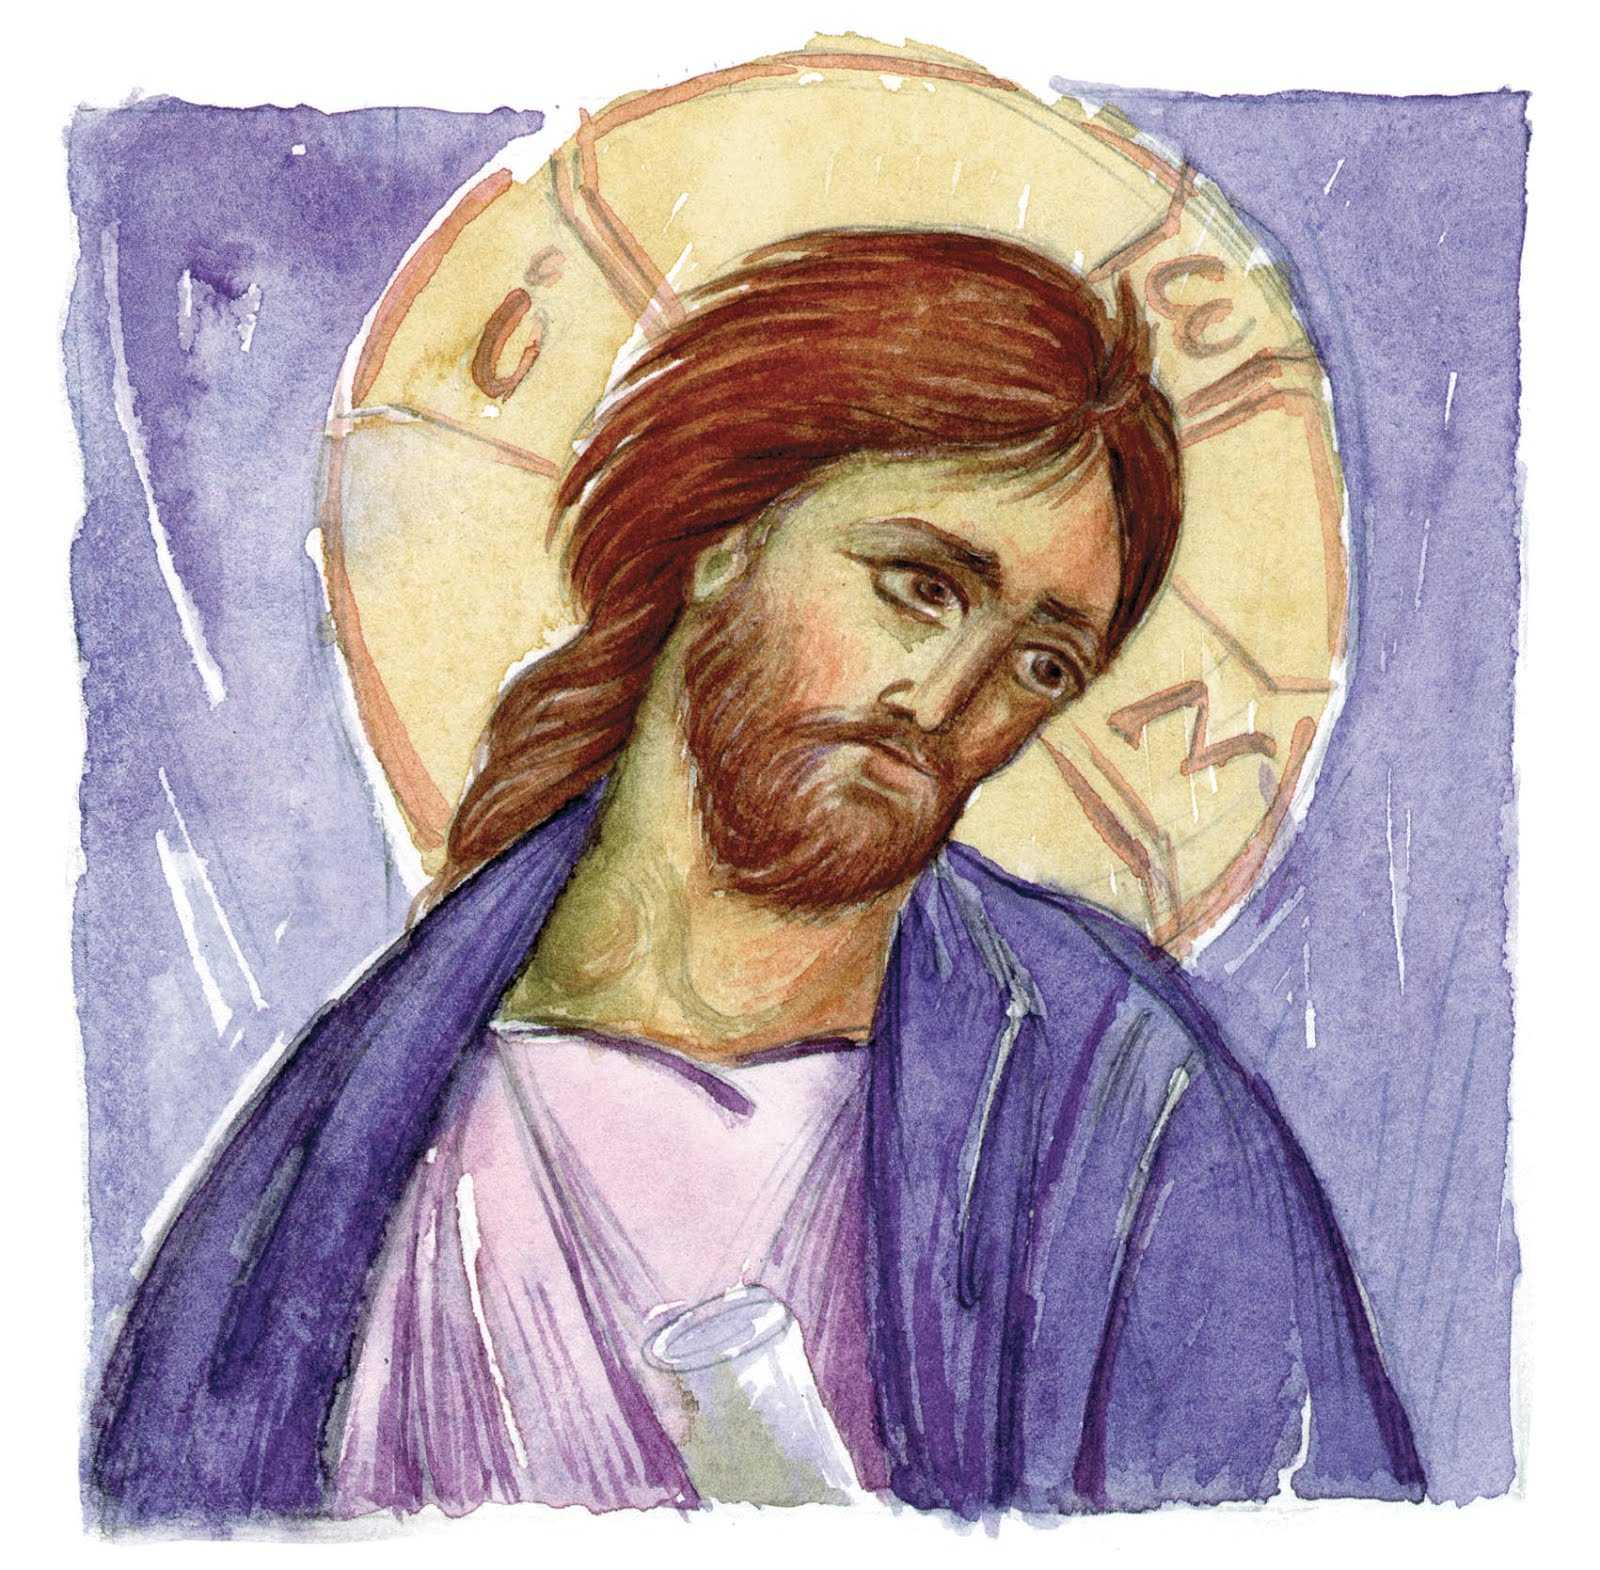 PREDICI AUDIO pline de seva si putere duhovniceasca la DUMINICA TANARULUI BOGAT: <i>&#8220;<b>Toata</b> viata noastra lui Hristos Dumnezeu sa o dam!&#8221;</i>